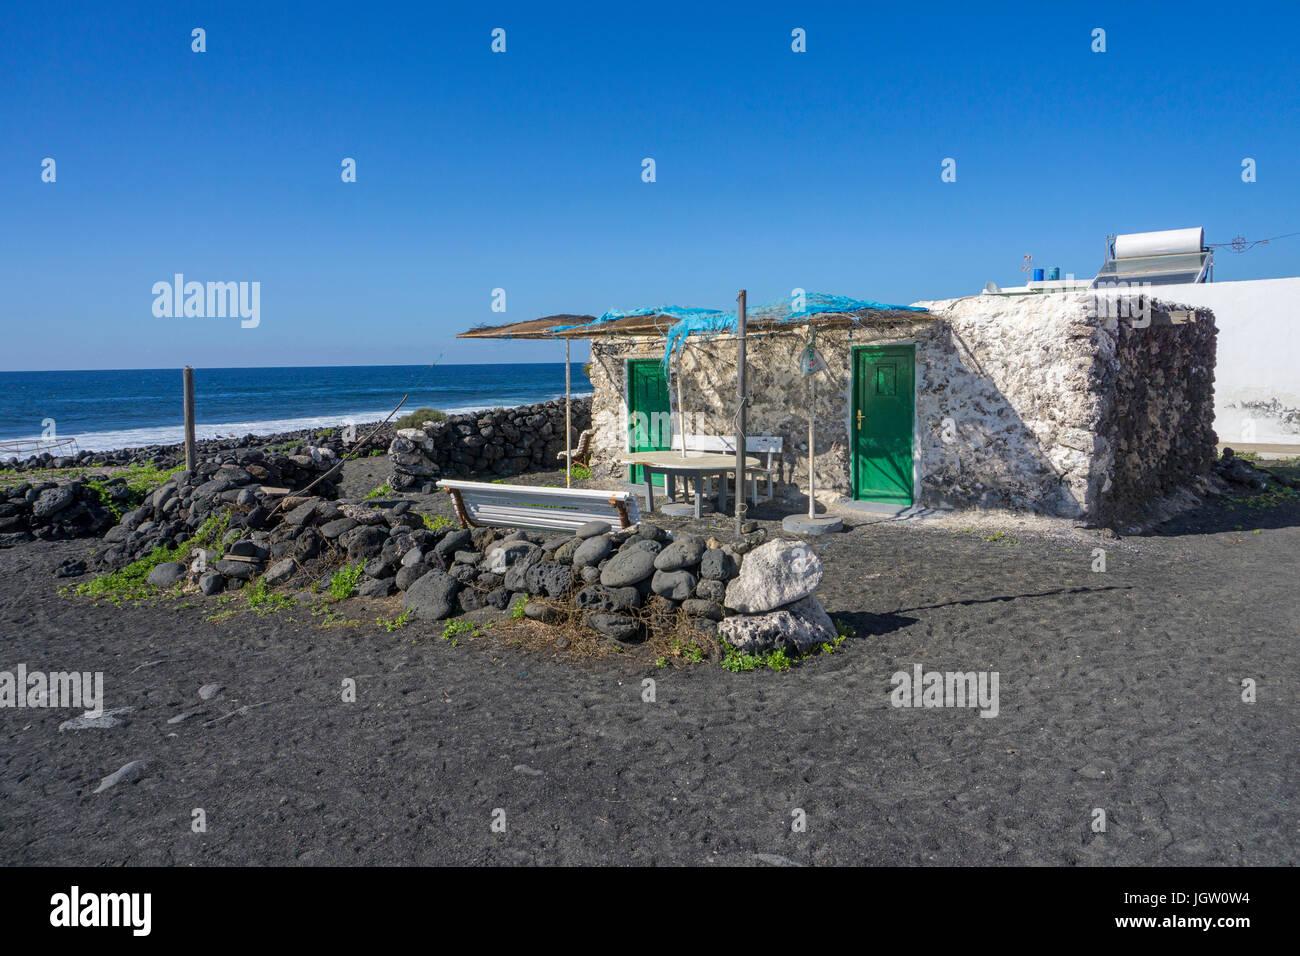 Small fishing house at the volcanic pebble beach, fishing village El Golfo, Lanzarote island, Canary islands, Spain, Stock Photo